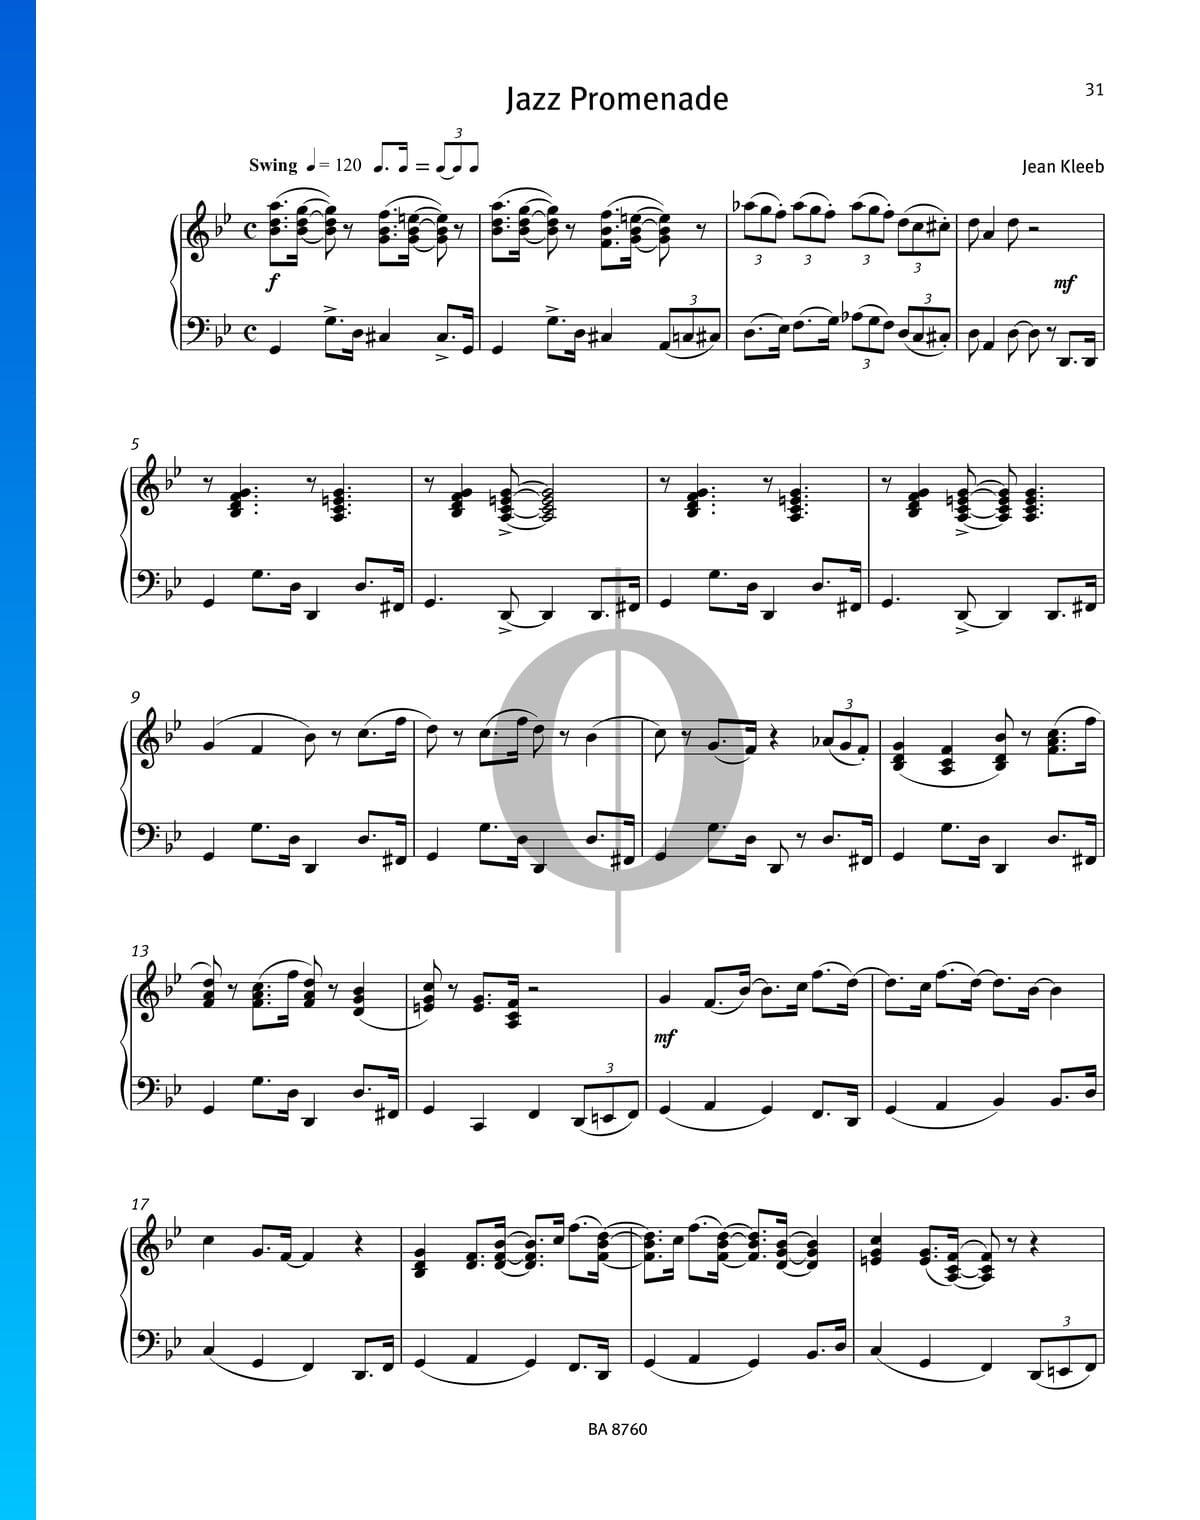 ▷ Jazz Promenade Sheet Music (Piano Solo) - PDF Download